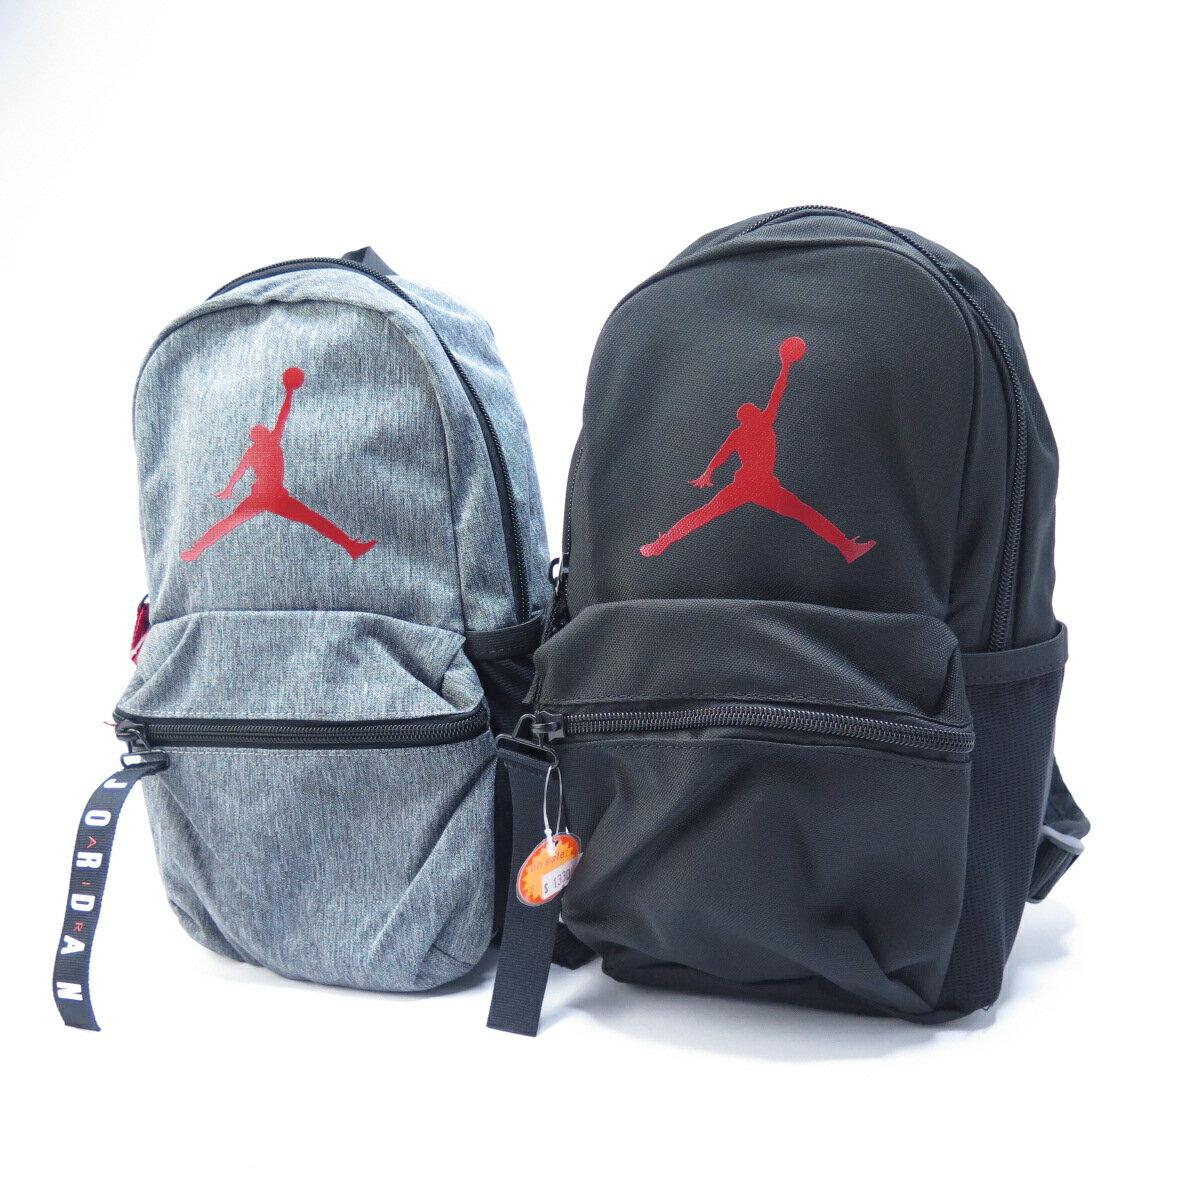 JORDAN 雙肩後背包 中款 JD2013010TD00- 2色 正黑/岩灰 【iSport愛運動】